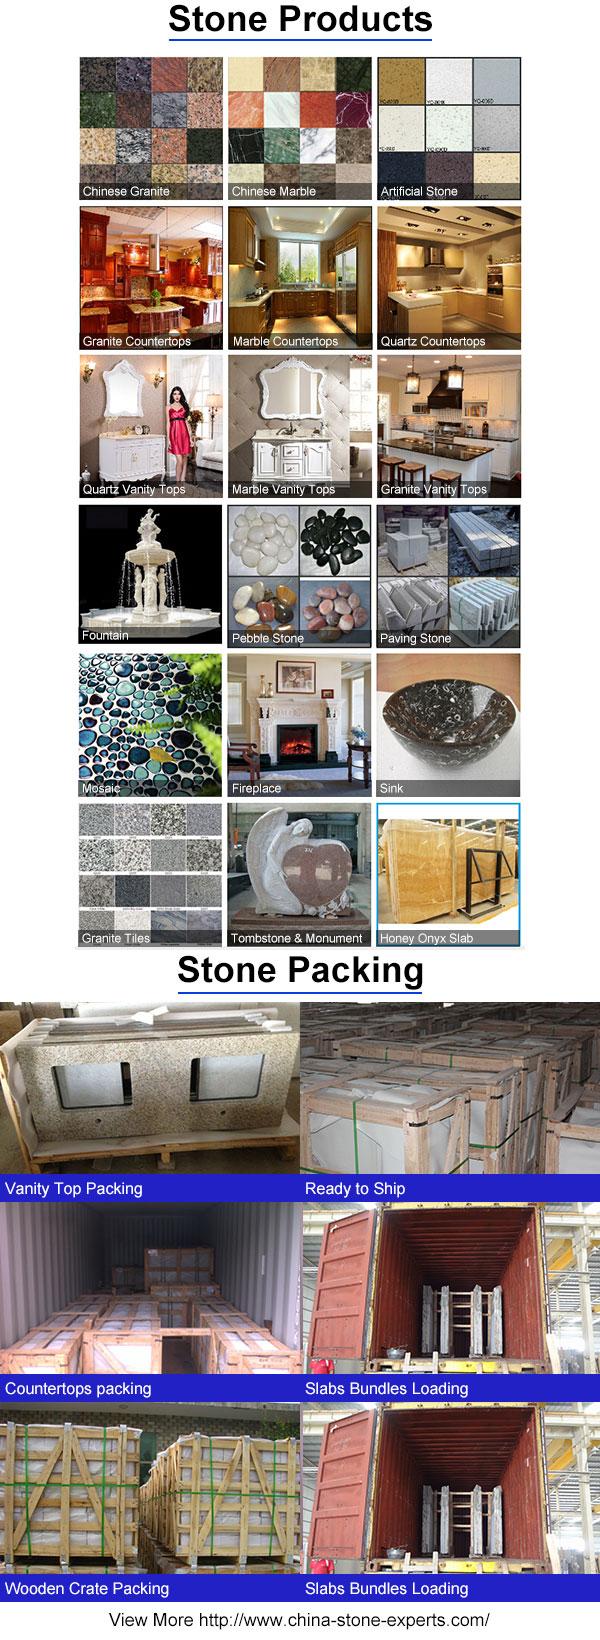 Super White Artifical Quartz Stone for Countertop or Tabletop